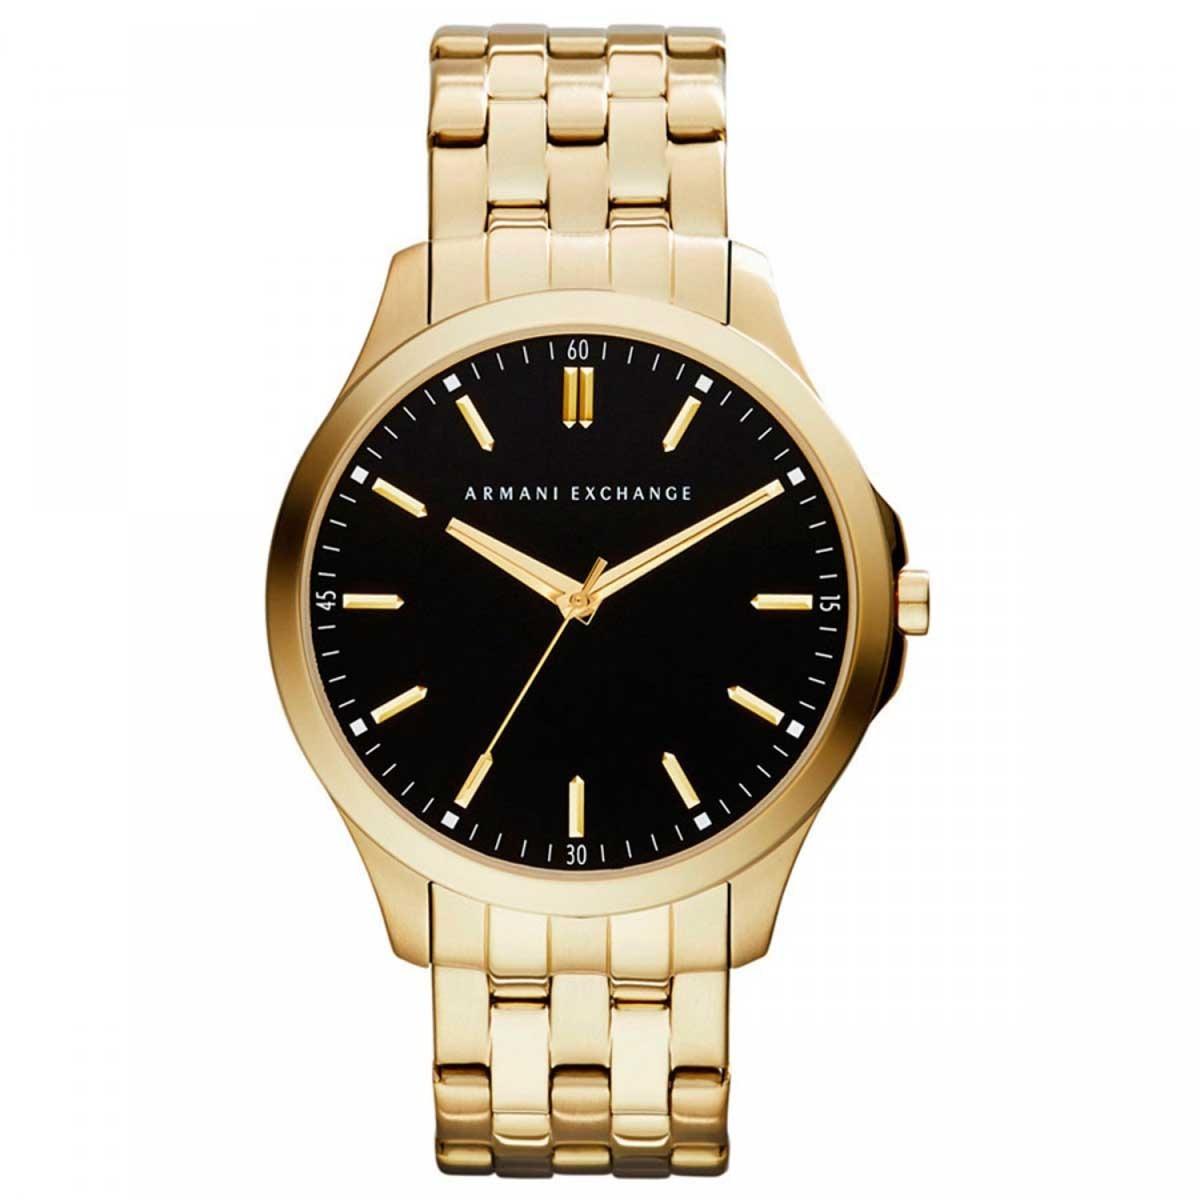 c86509c7eb5 relógio armani exchange masculino dourado ax2145 4pn. Carregando zoom.